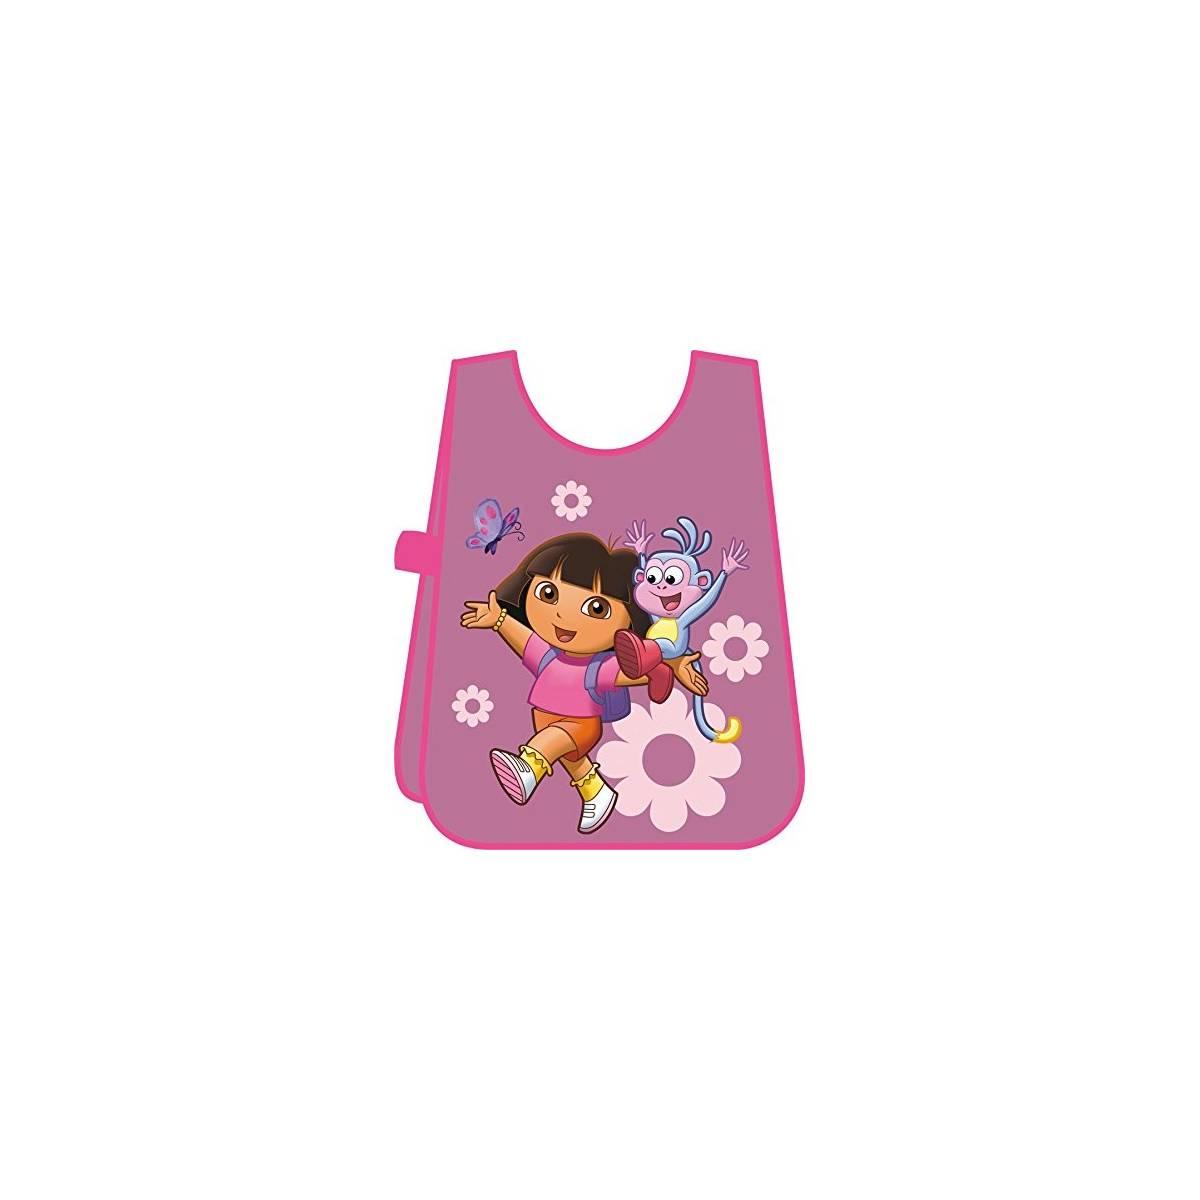 Dora - Tablier de Peinture Enfant - Rose - Disney